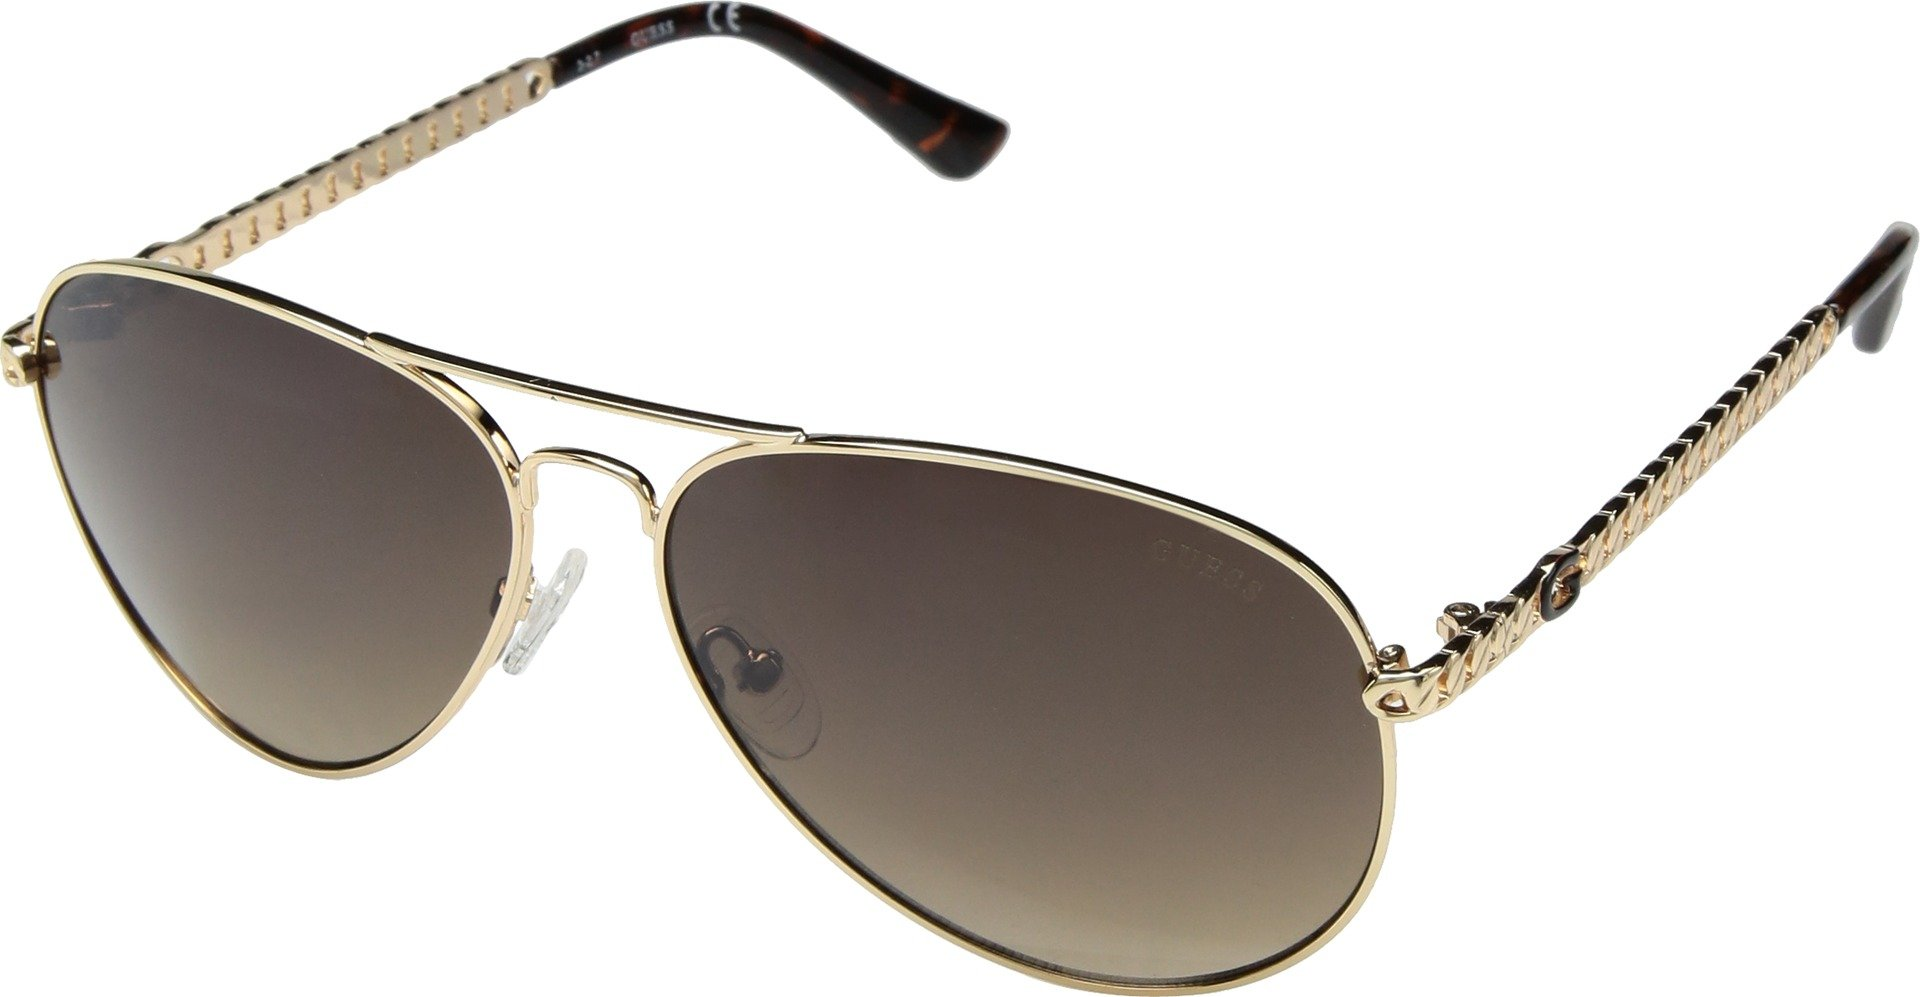 09d0675b10e GUESS Factory Women s Metal Chain-Link Aviator Sunglasses